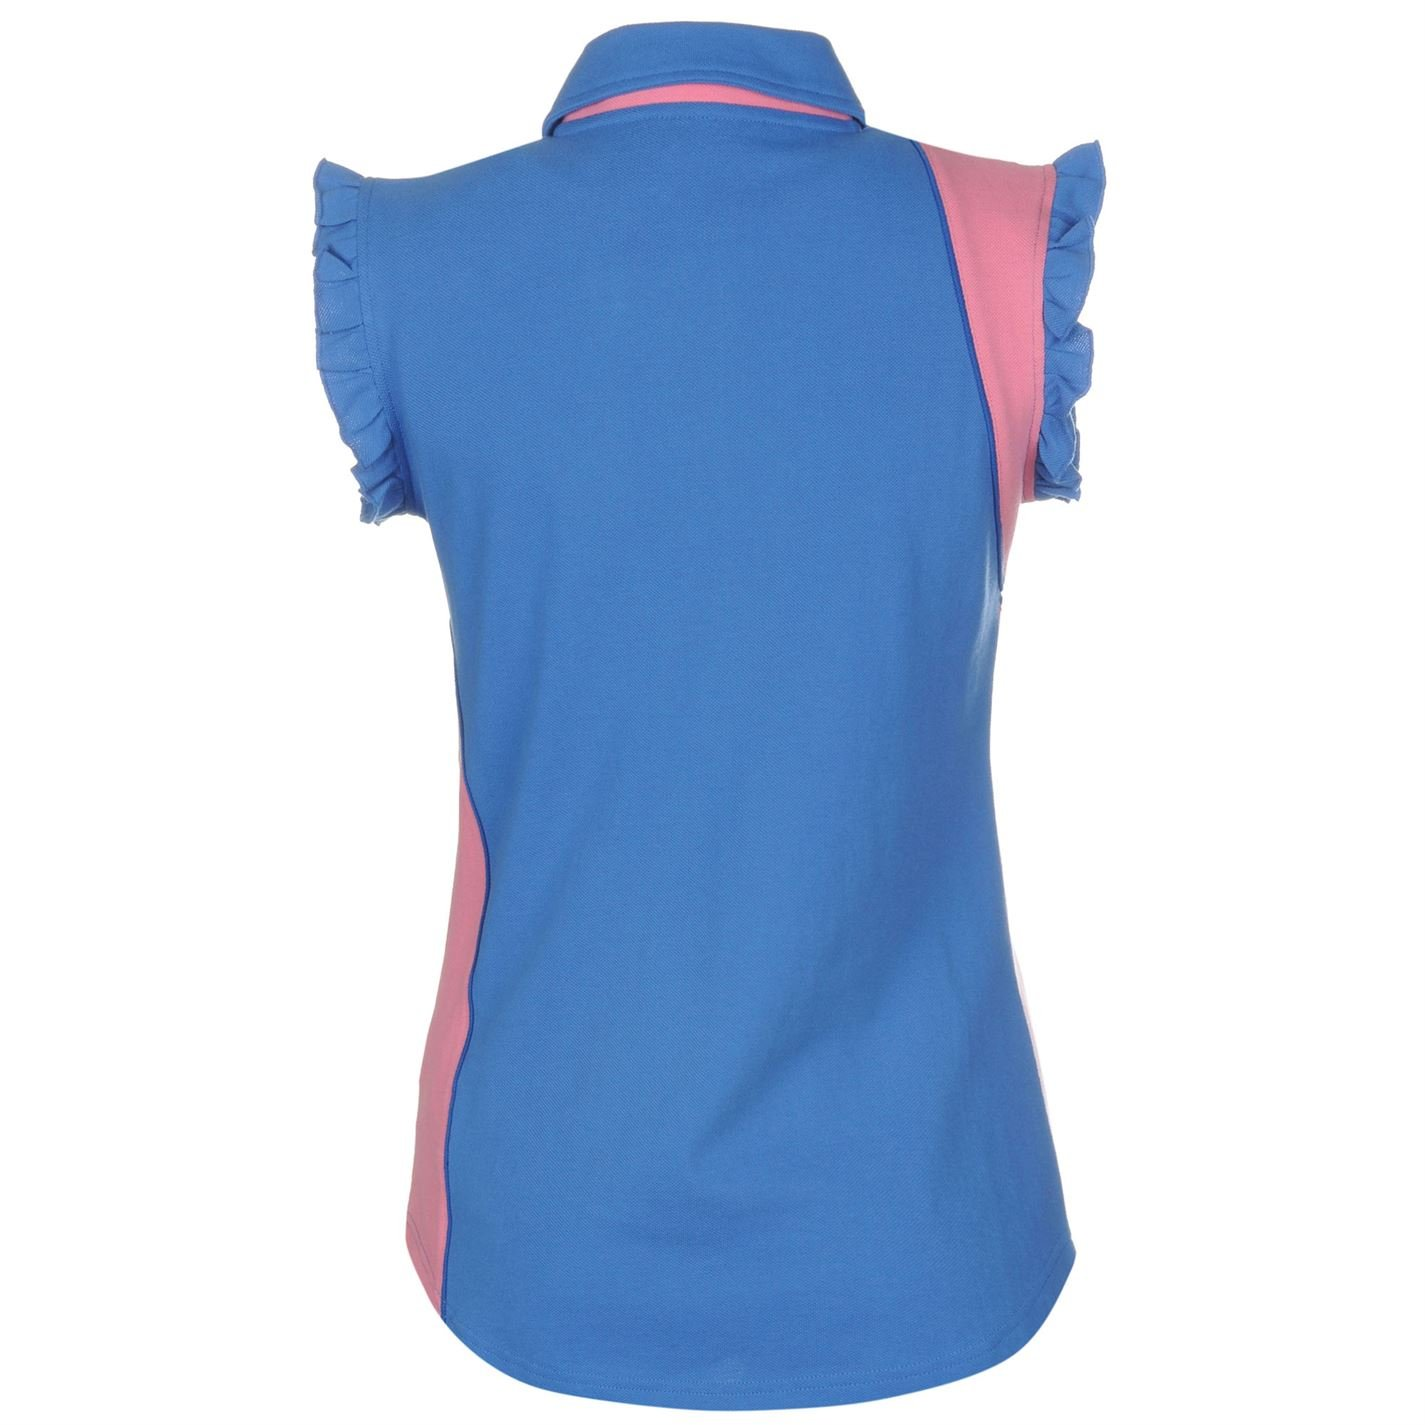 Requisite Mujer aermel los Polo Camiseta Reitsport té Top Polo ...